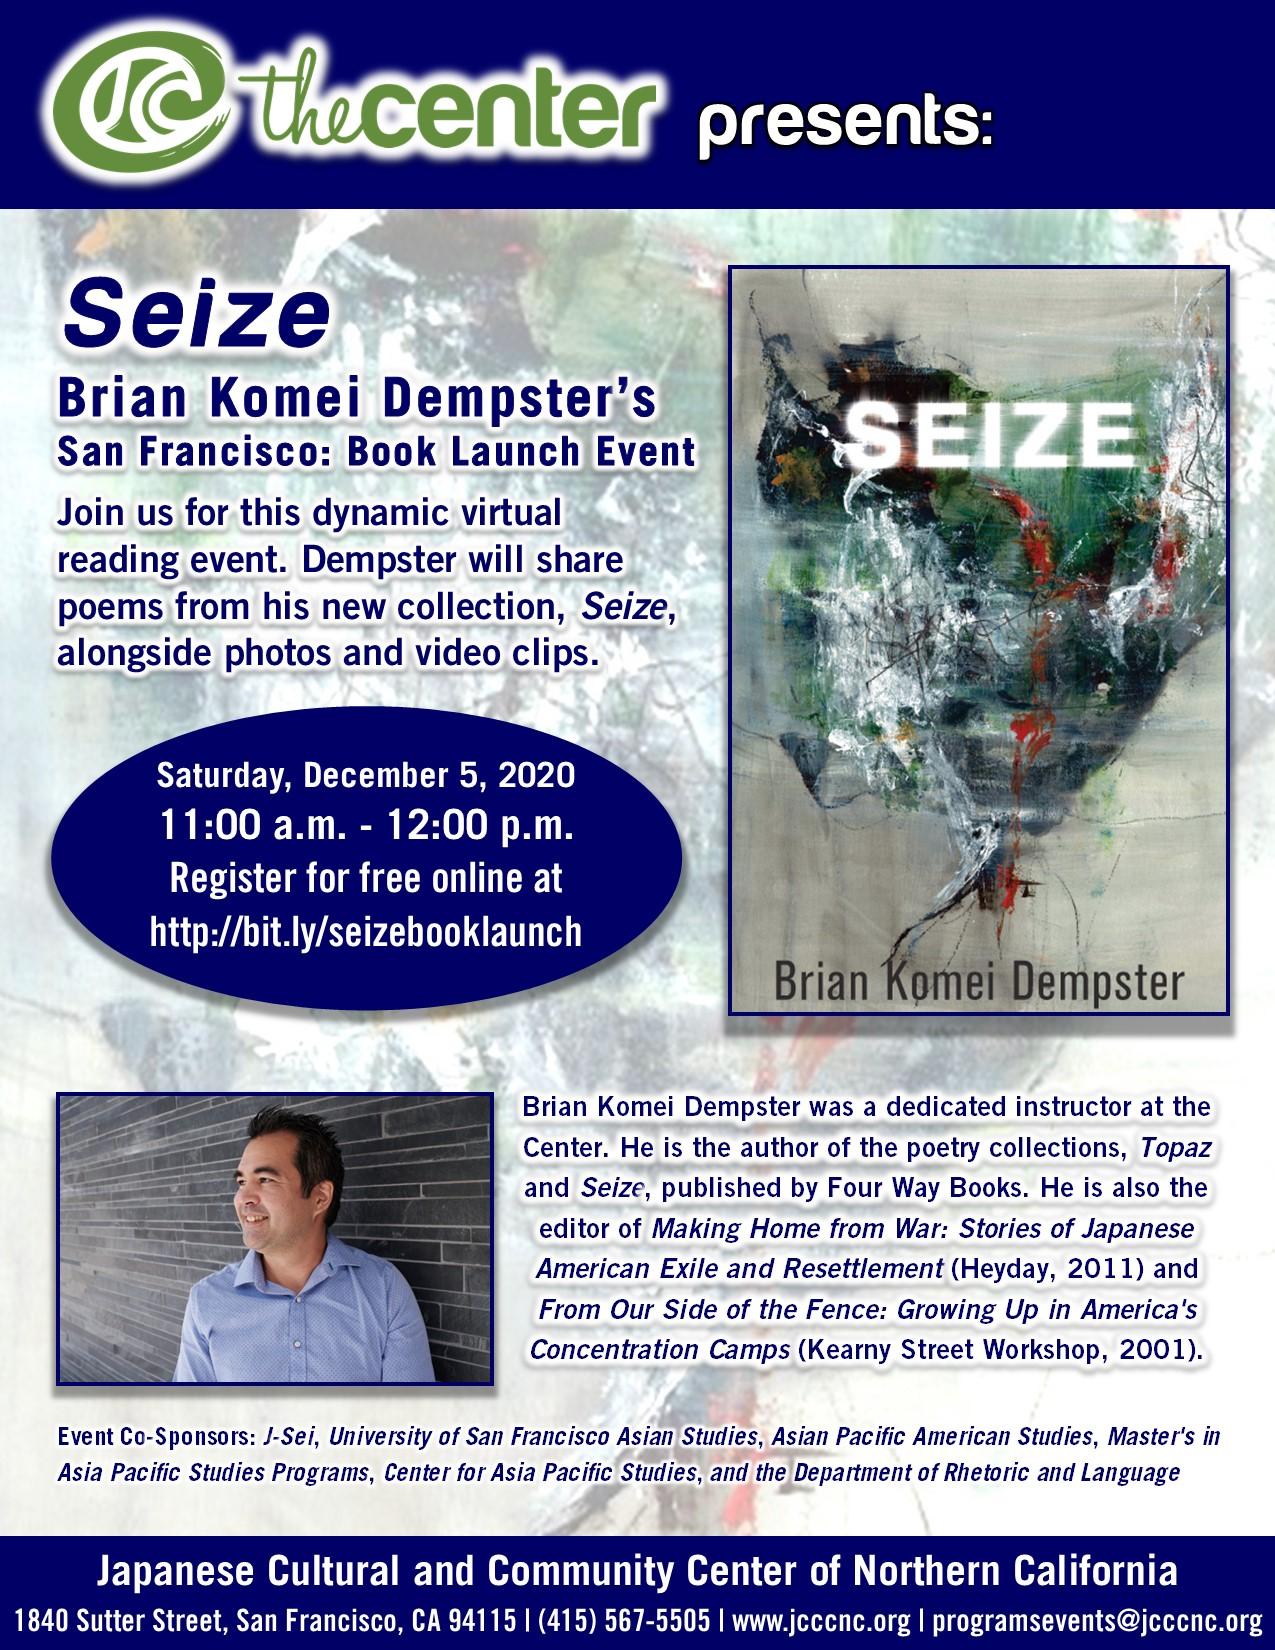 Seize by Brian Komei Dempster – Virtual Book Launch